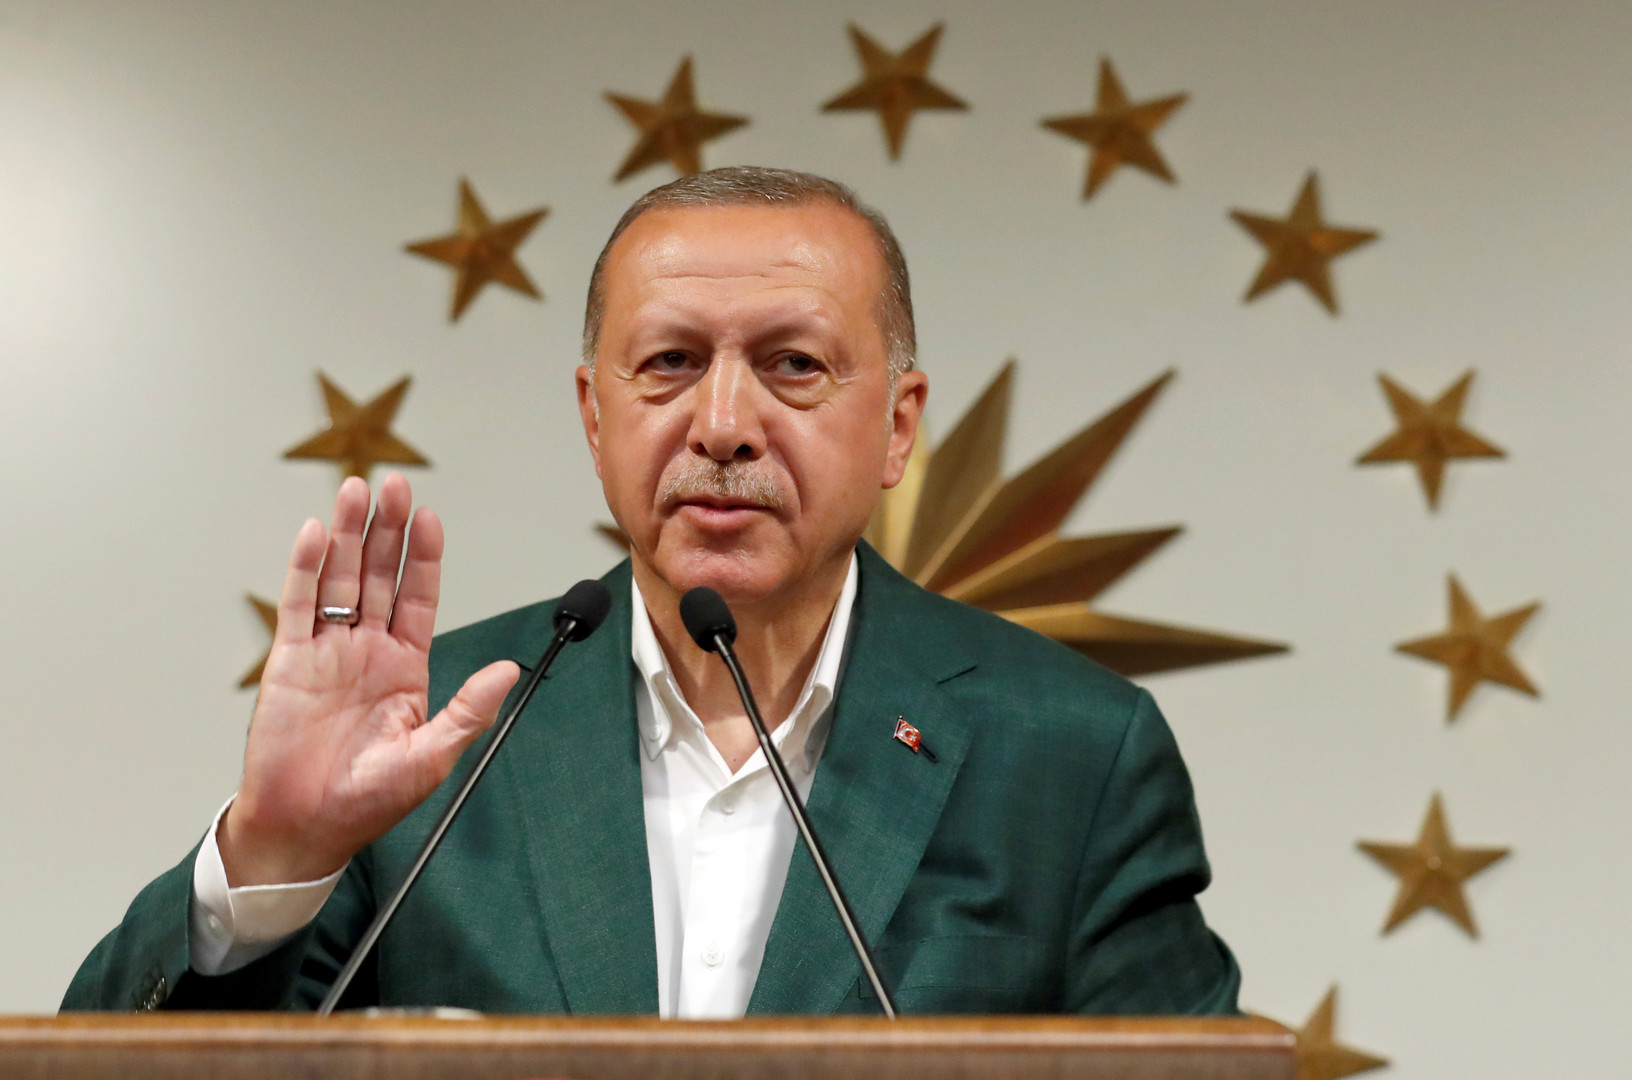 أردوغان: سنواصل الصراع حتى صدور قرار نهائي بشأن انتخابات اسطنبول